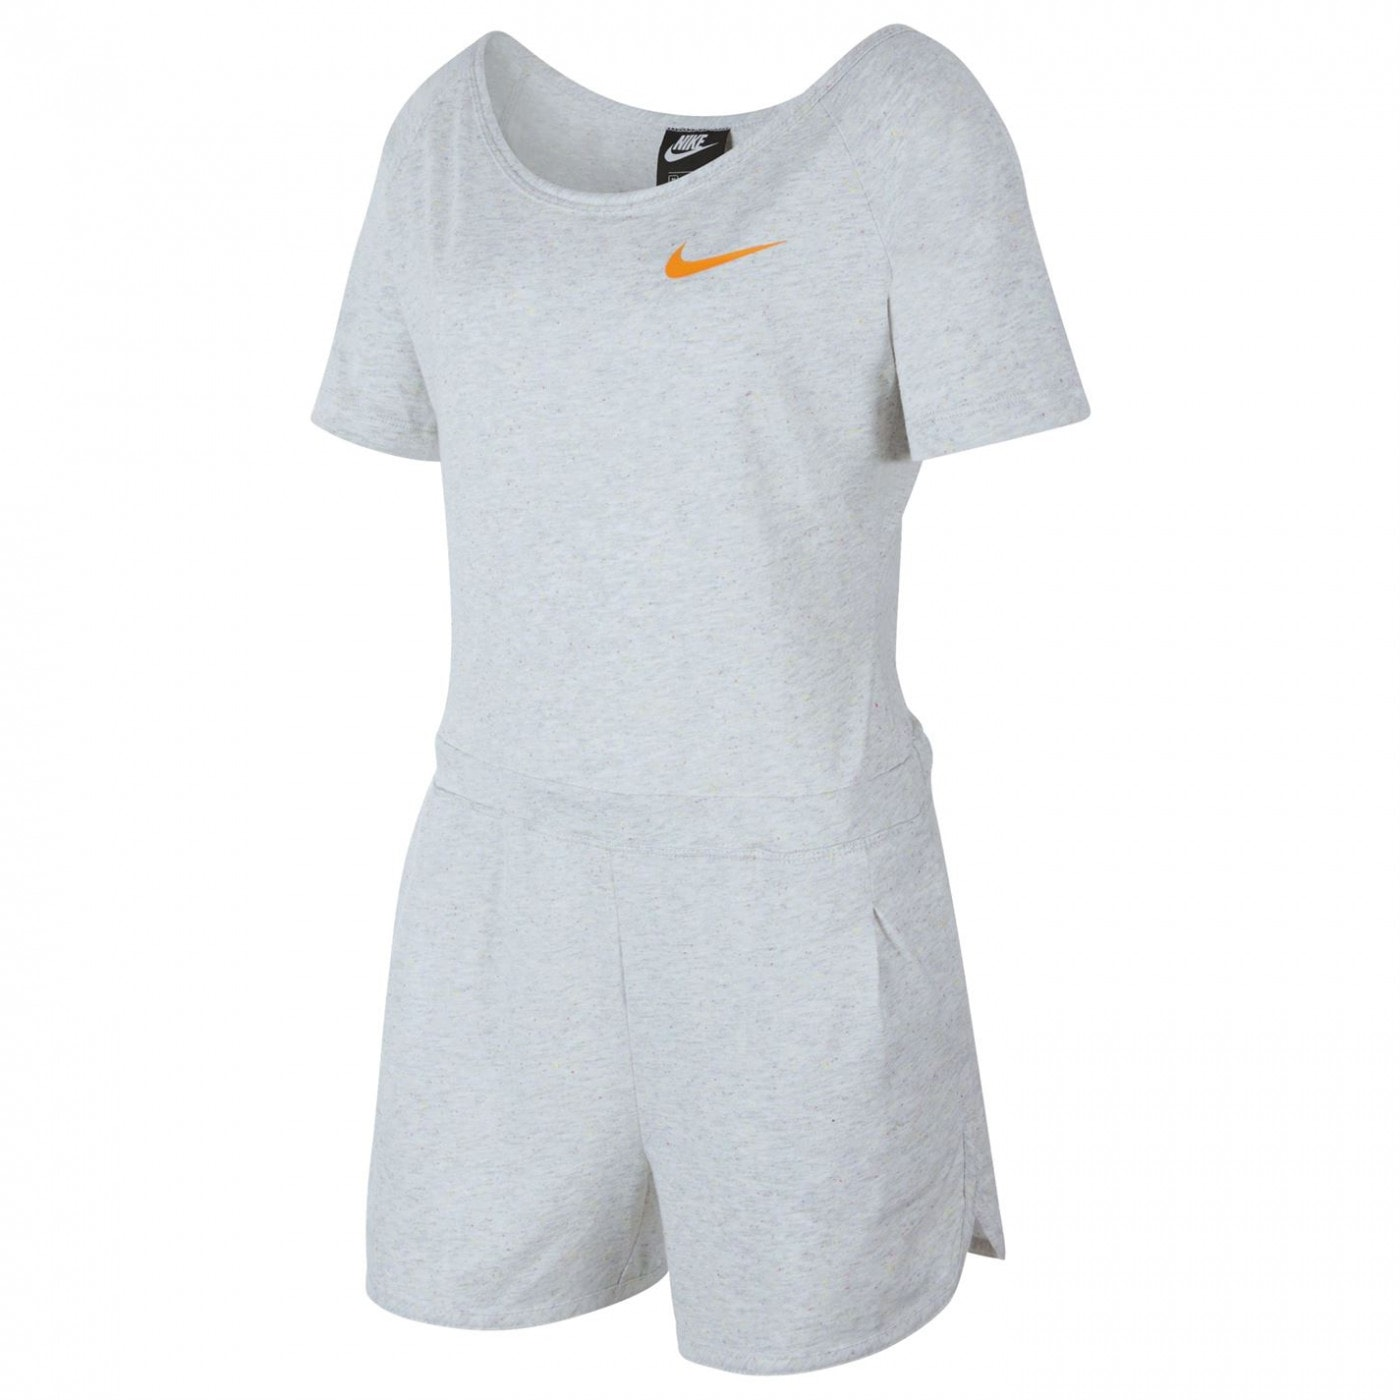 Nike Novelty Playsuit Junior Girls